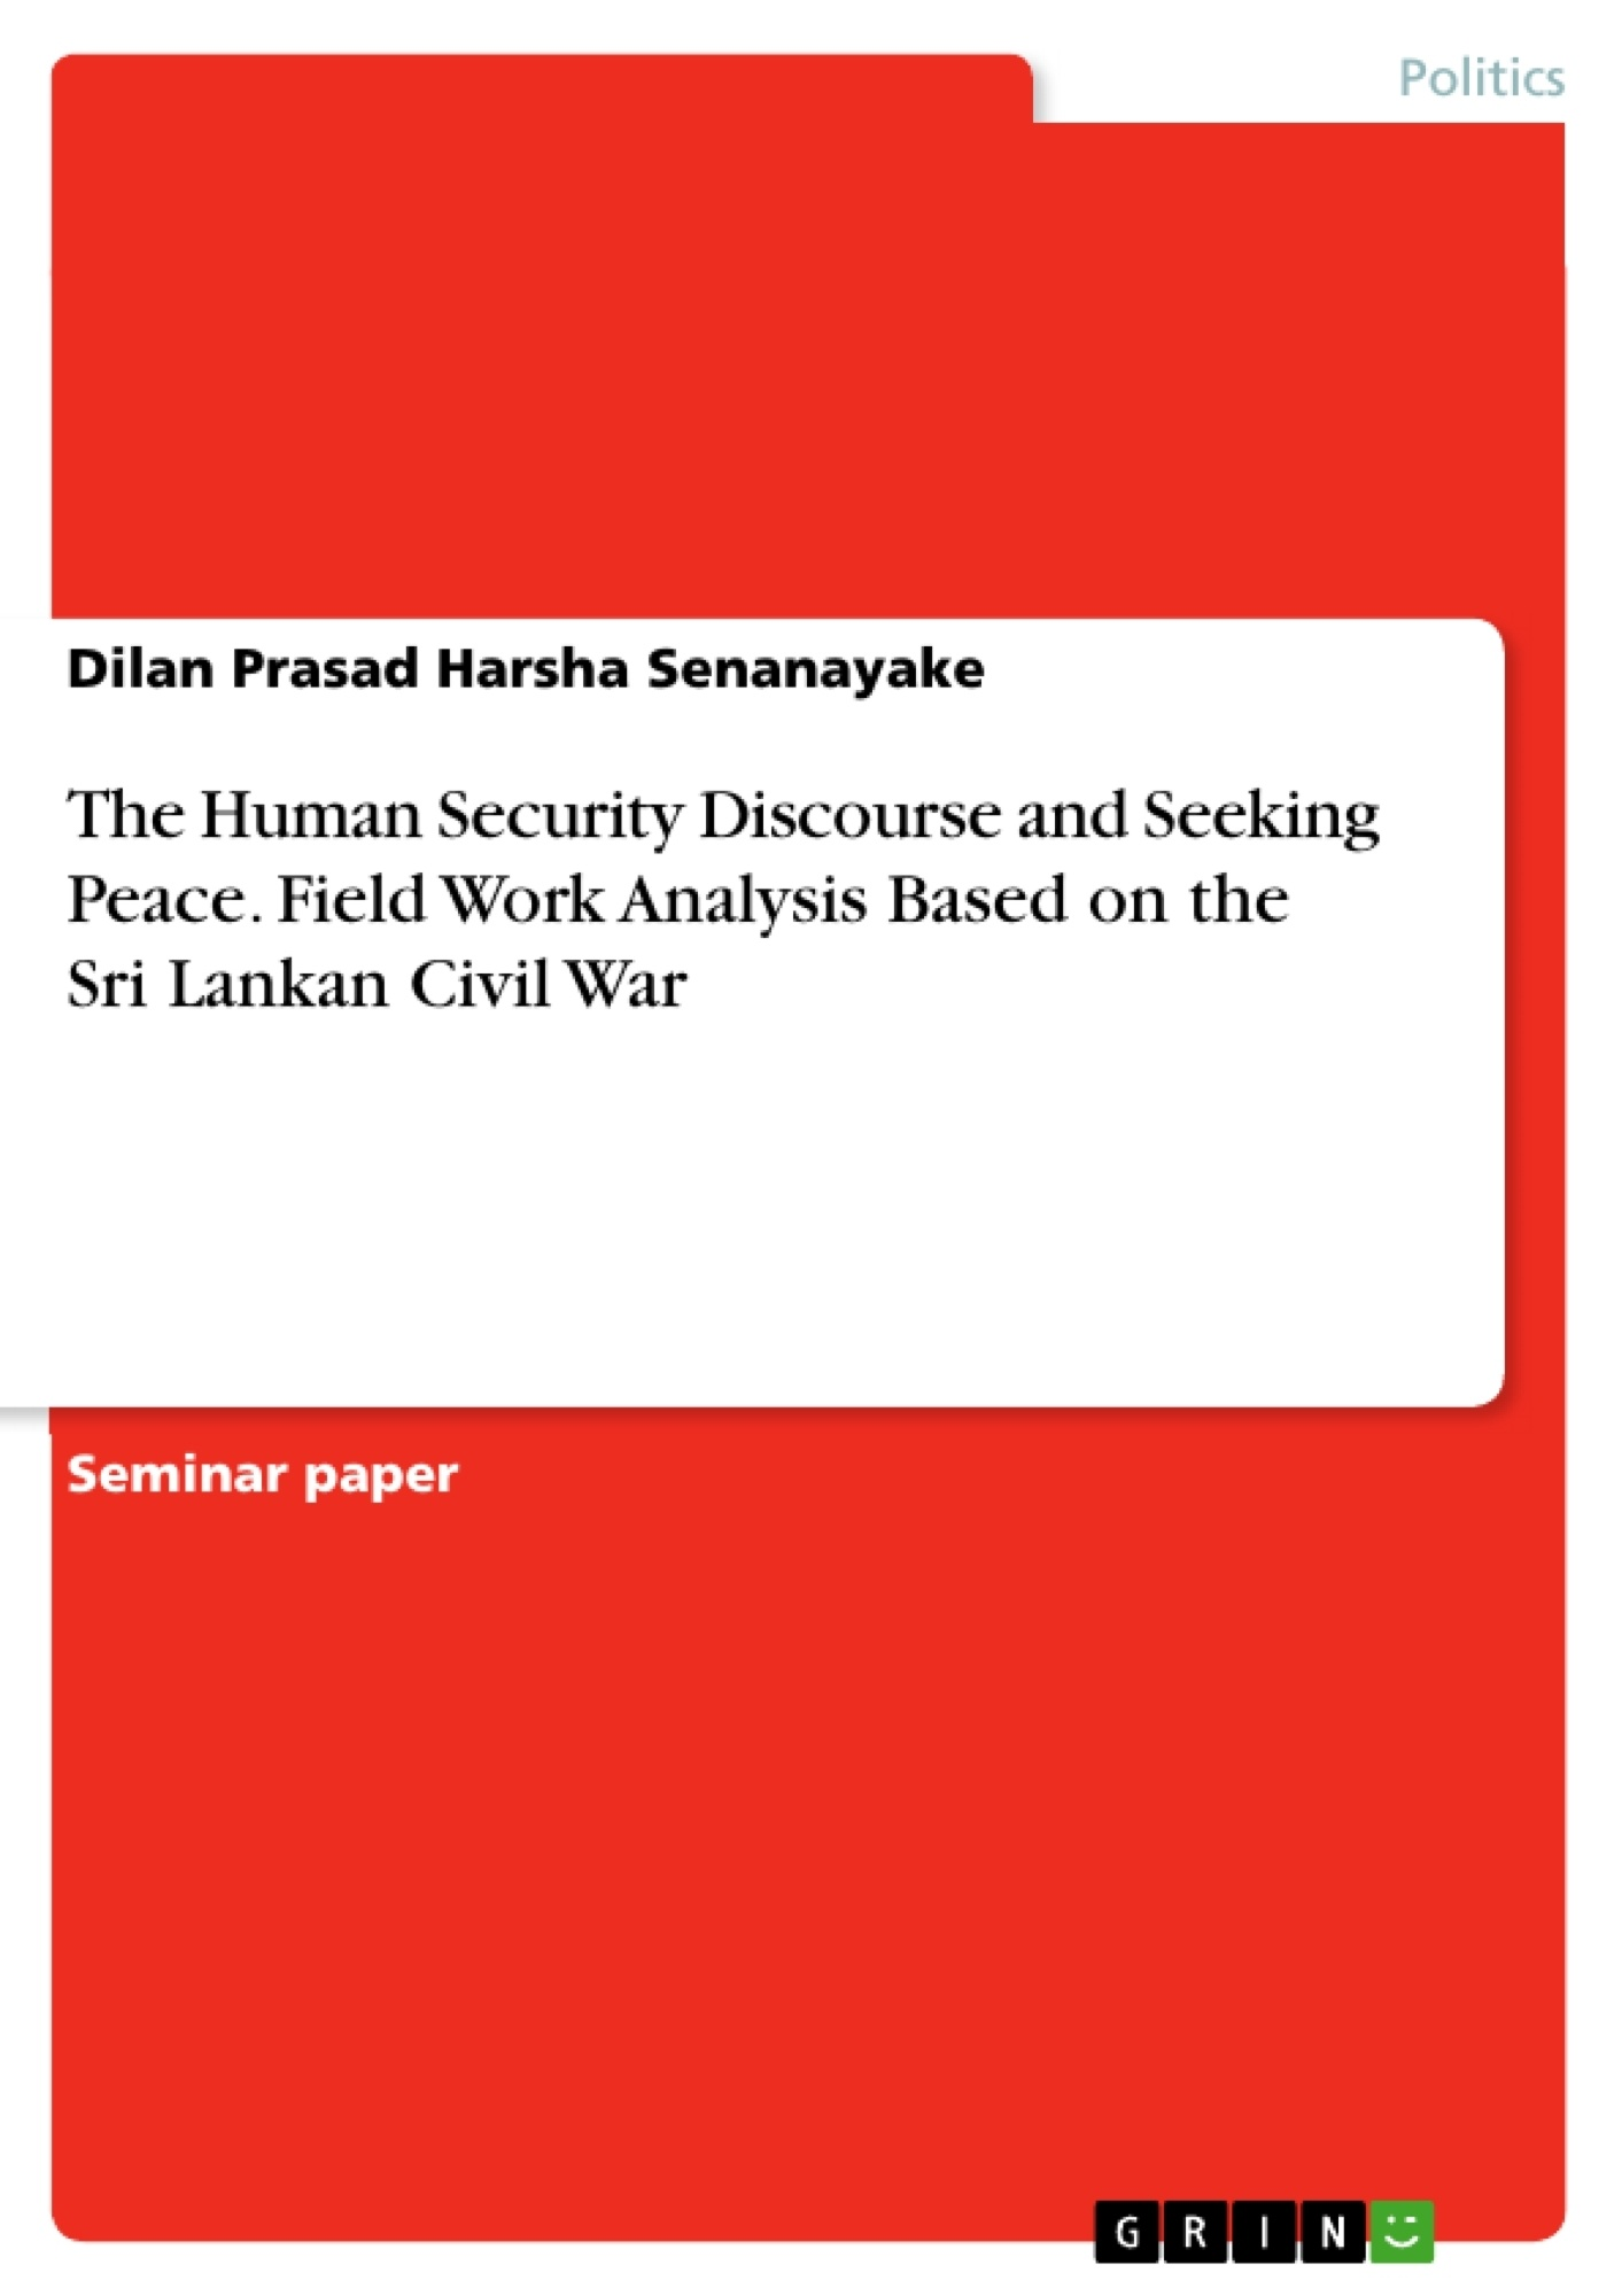 Title: The Human Security Discourse and Seeking Peace. Field Work Analysis Based on the Sri Lankan Civil War